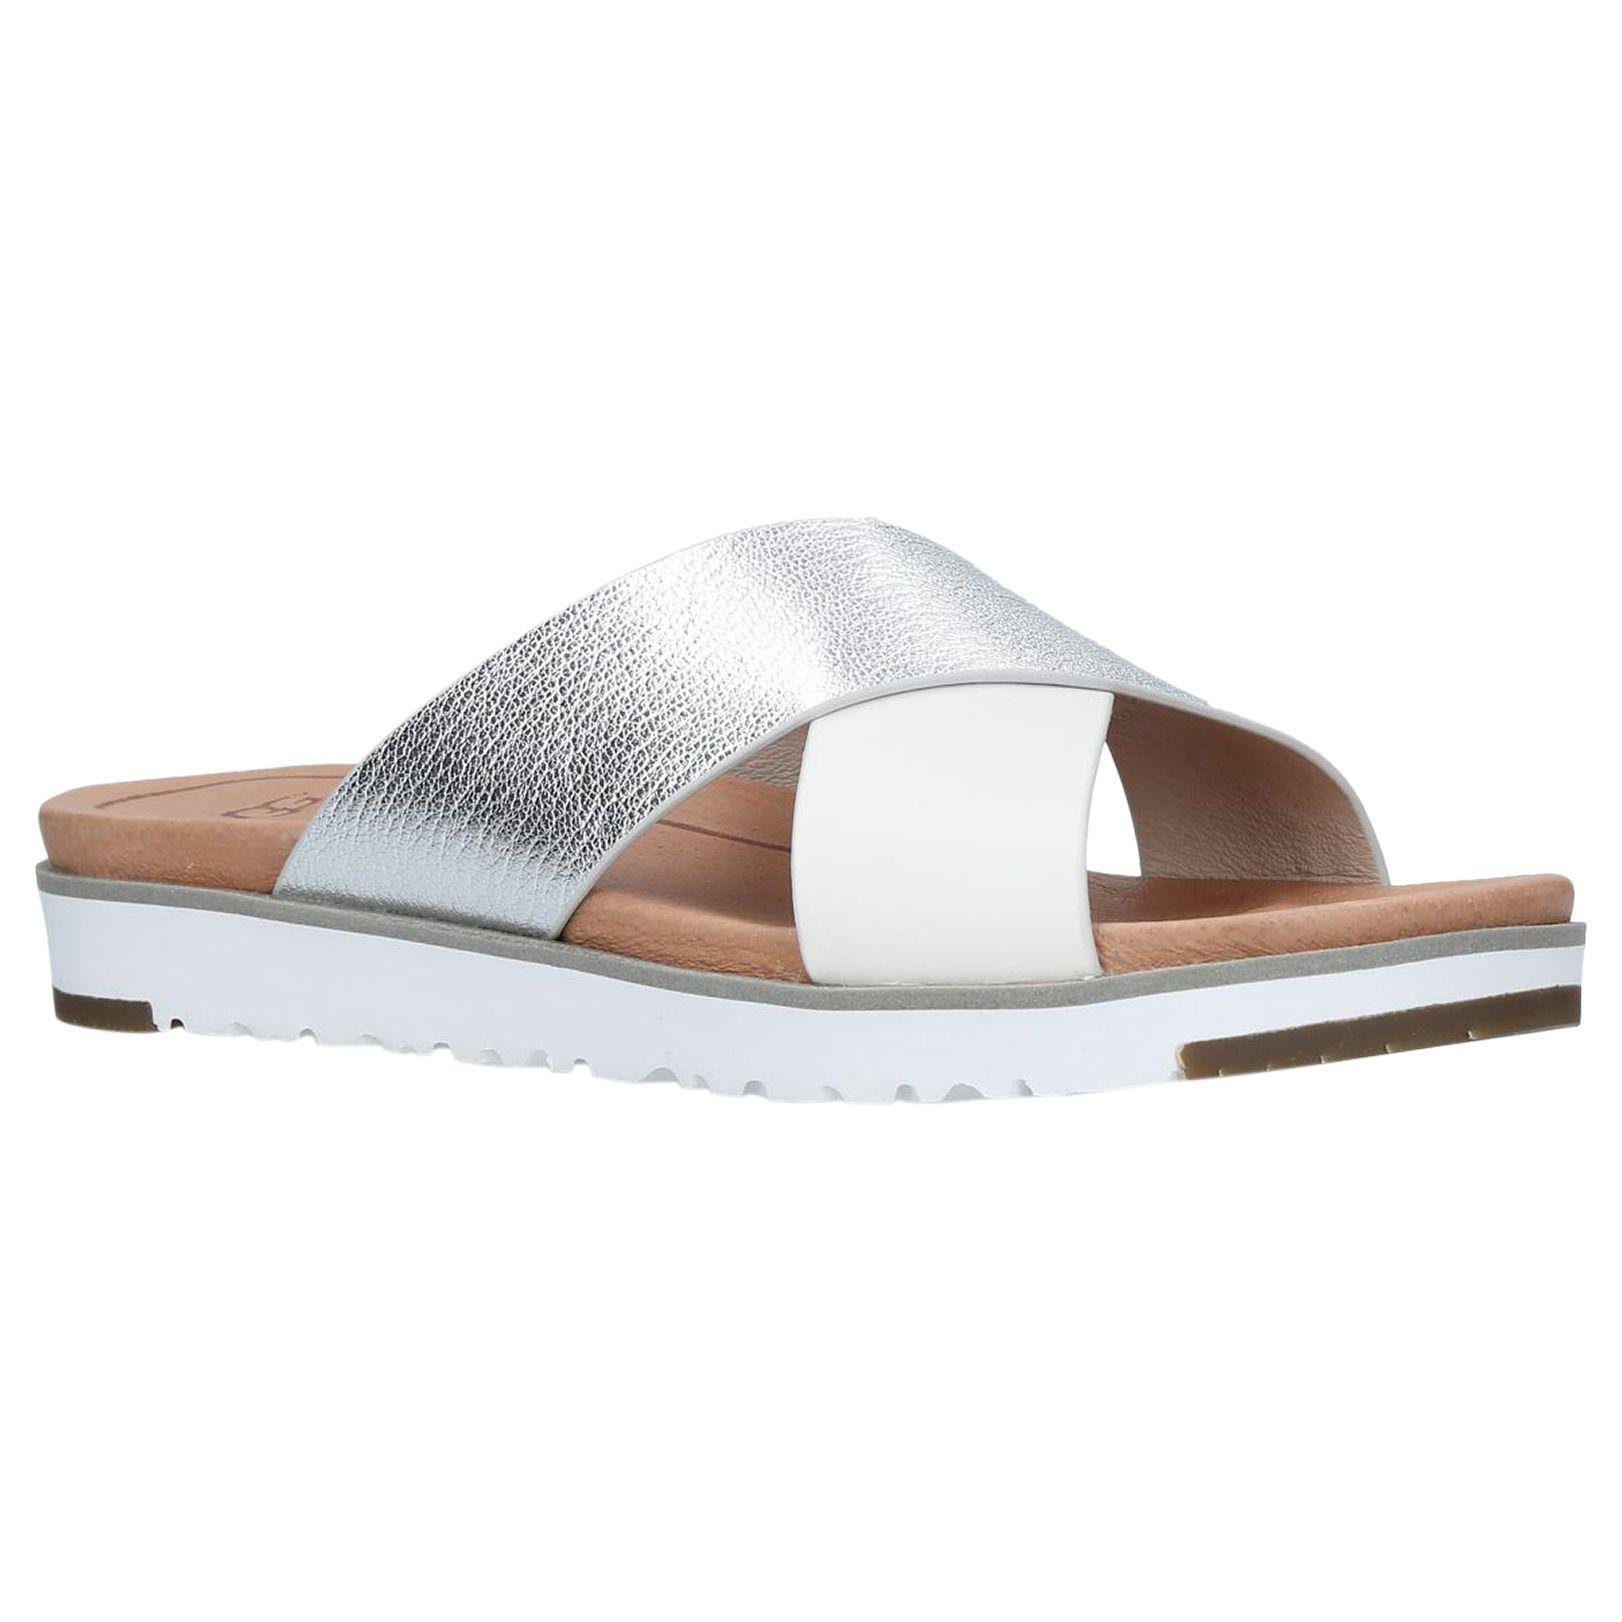 ca3dd08c53b7 UGG Kari Cross Strap Sandals - Lyst